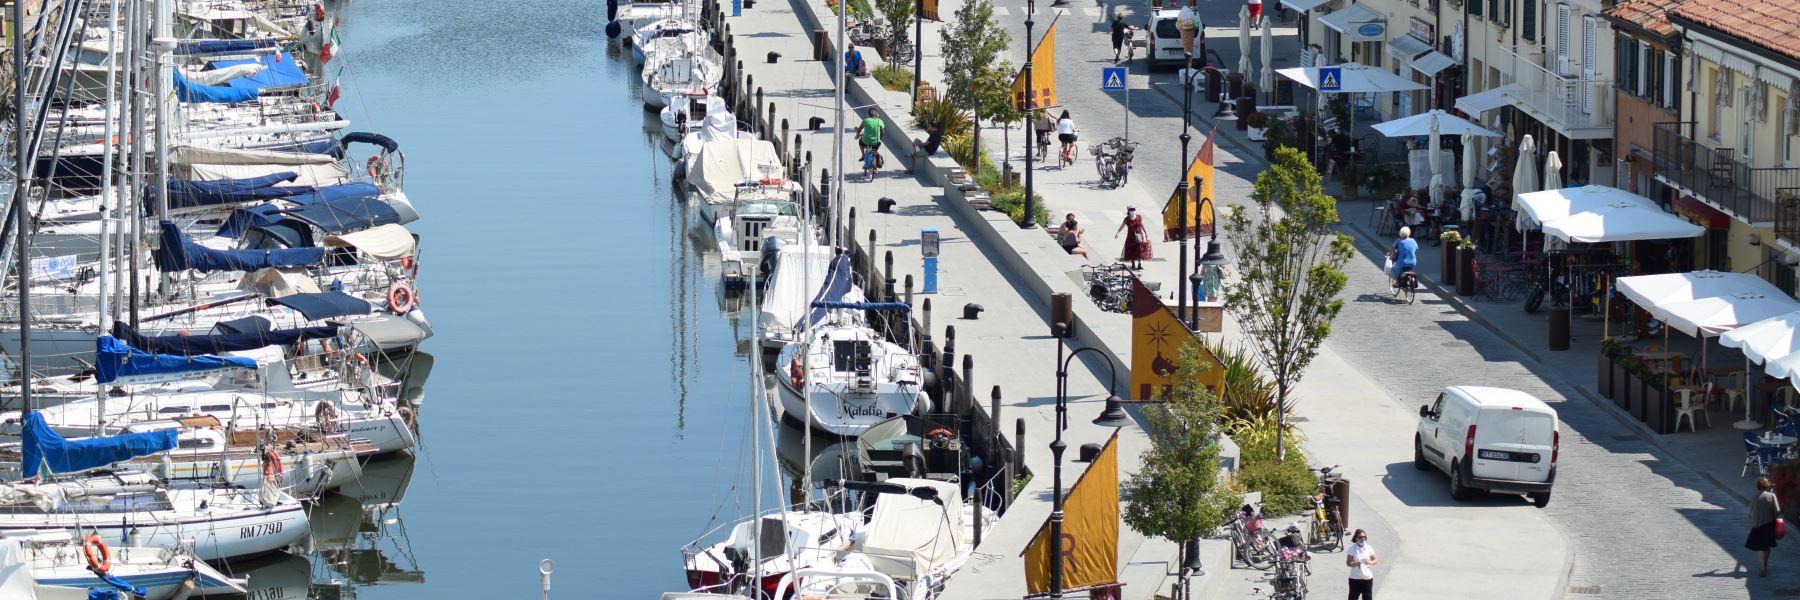 Borgo Marina - Bourg des Pêcheurs